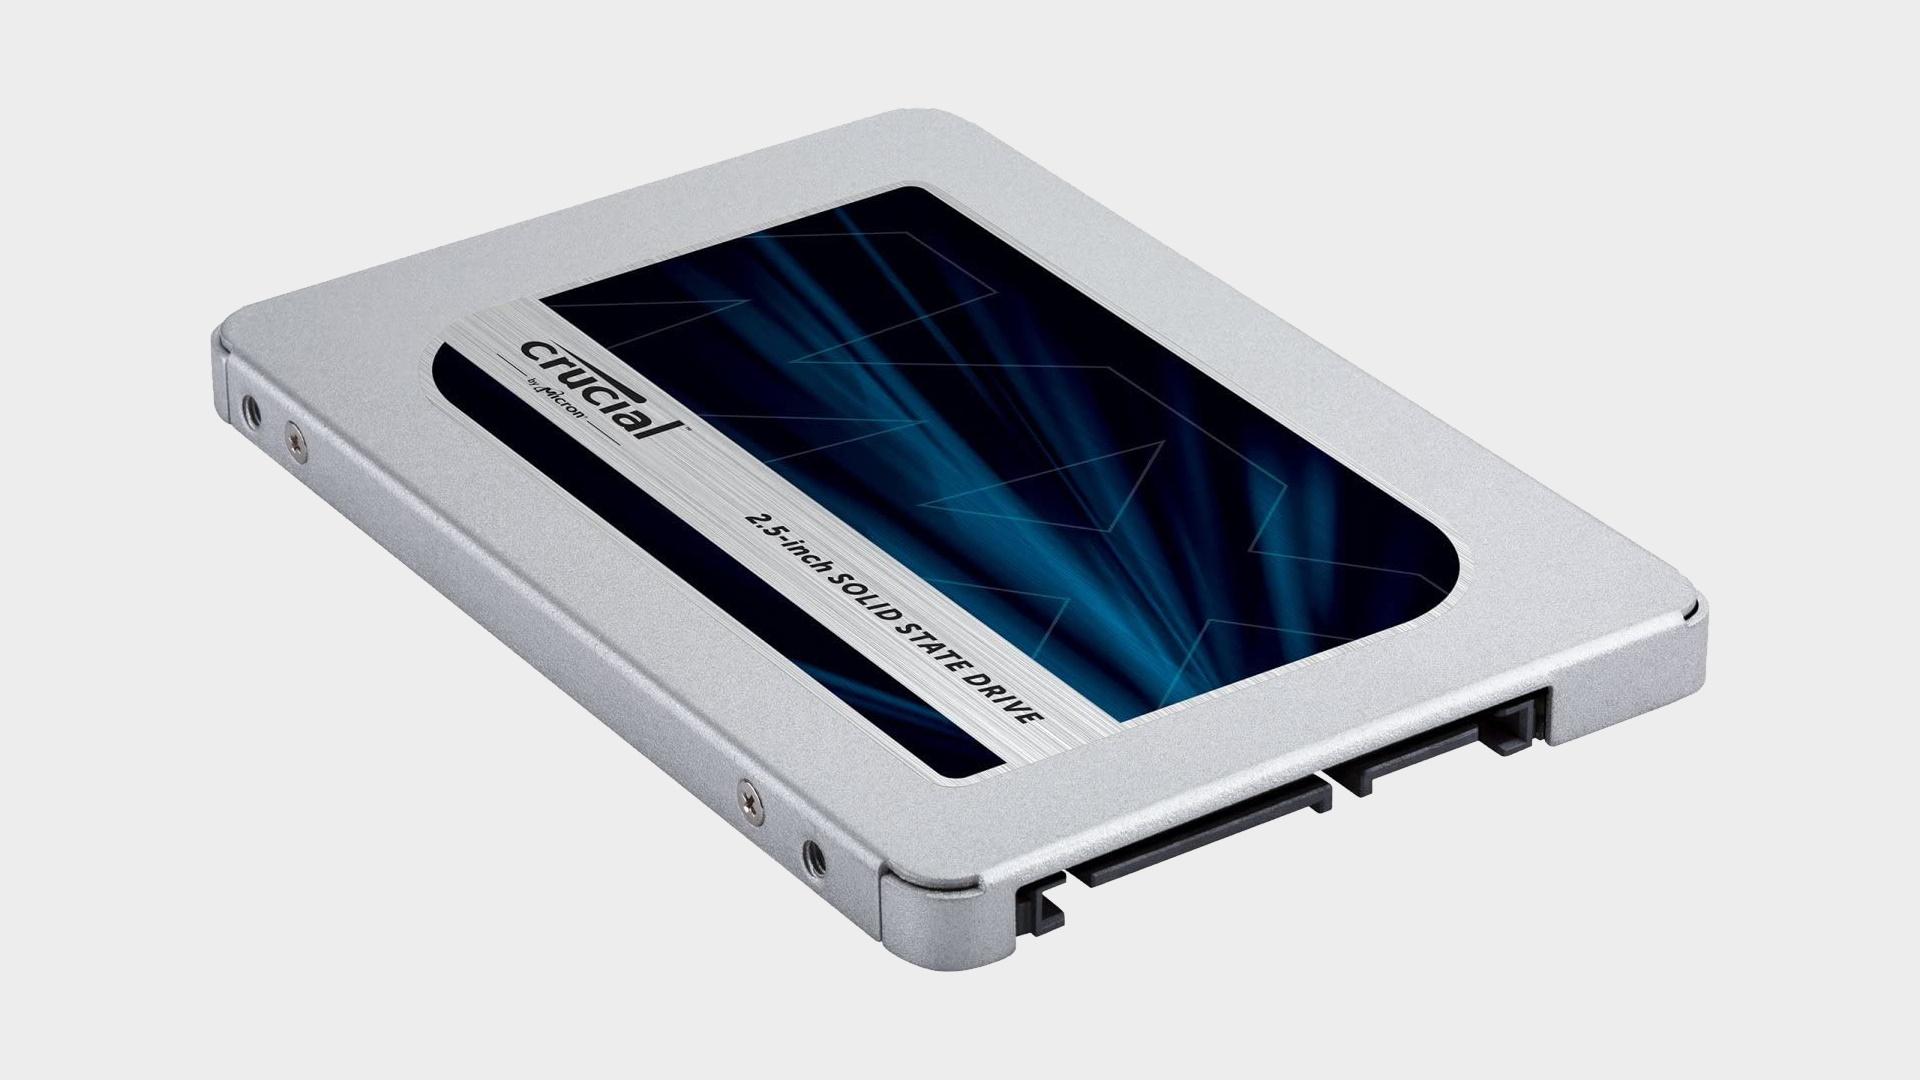 Crucial MX500 500GB SATA SSD